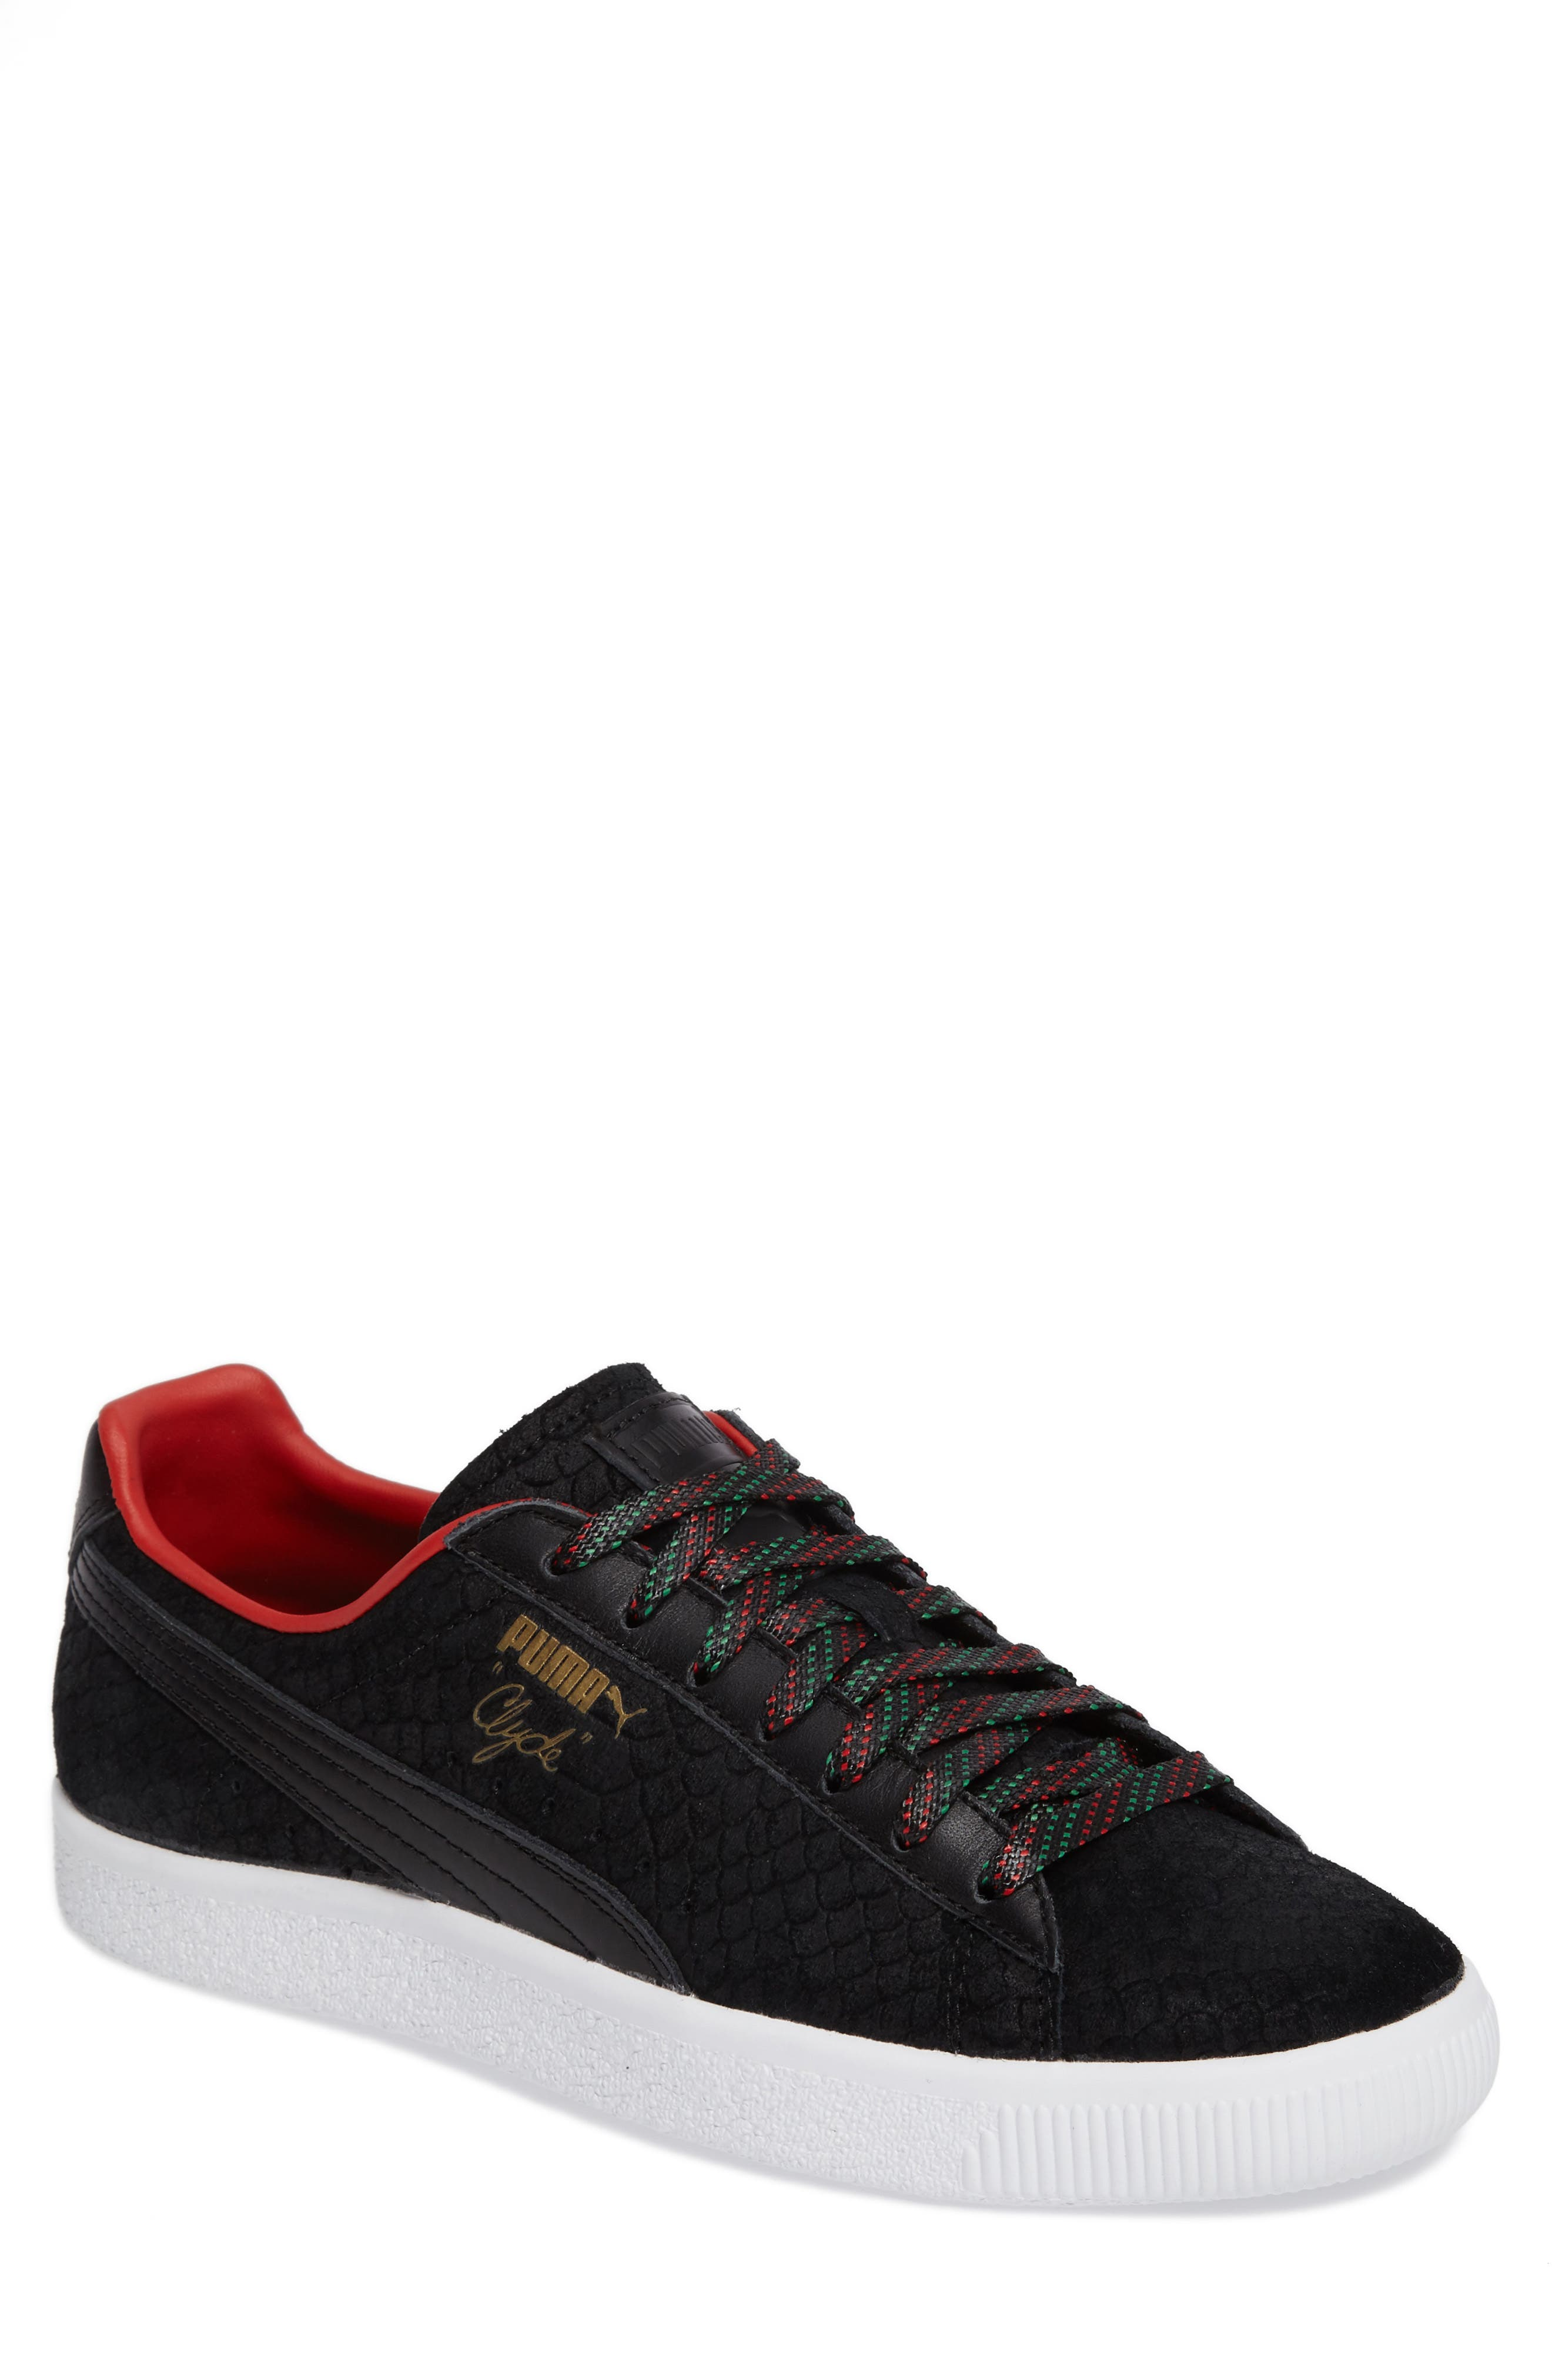 Clyde GCC Sneaker,                             Main thumbnail 1, color,                             001